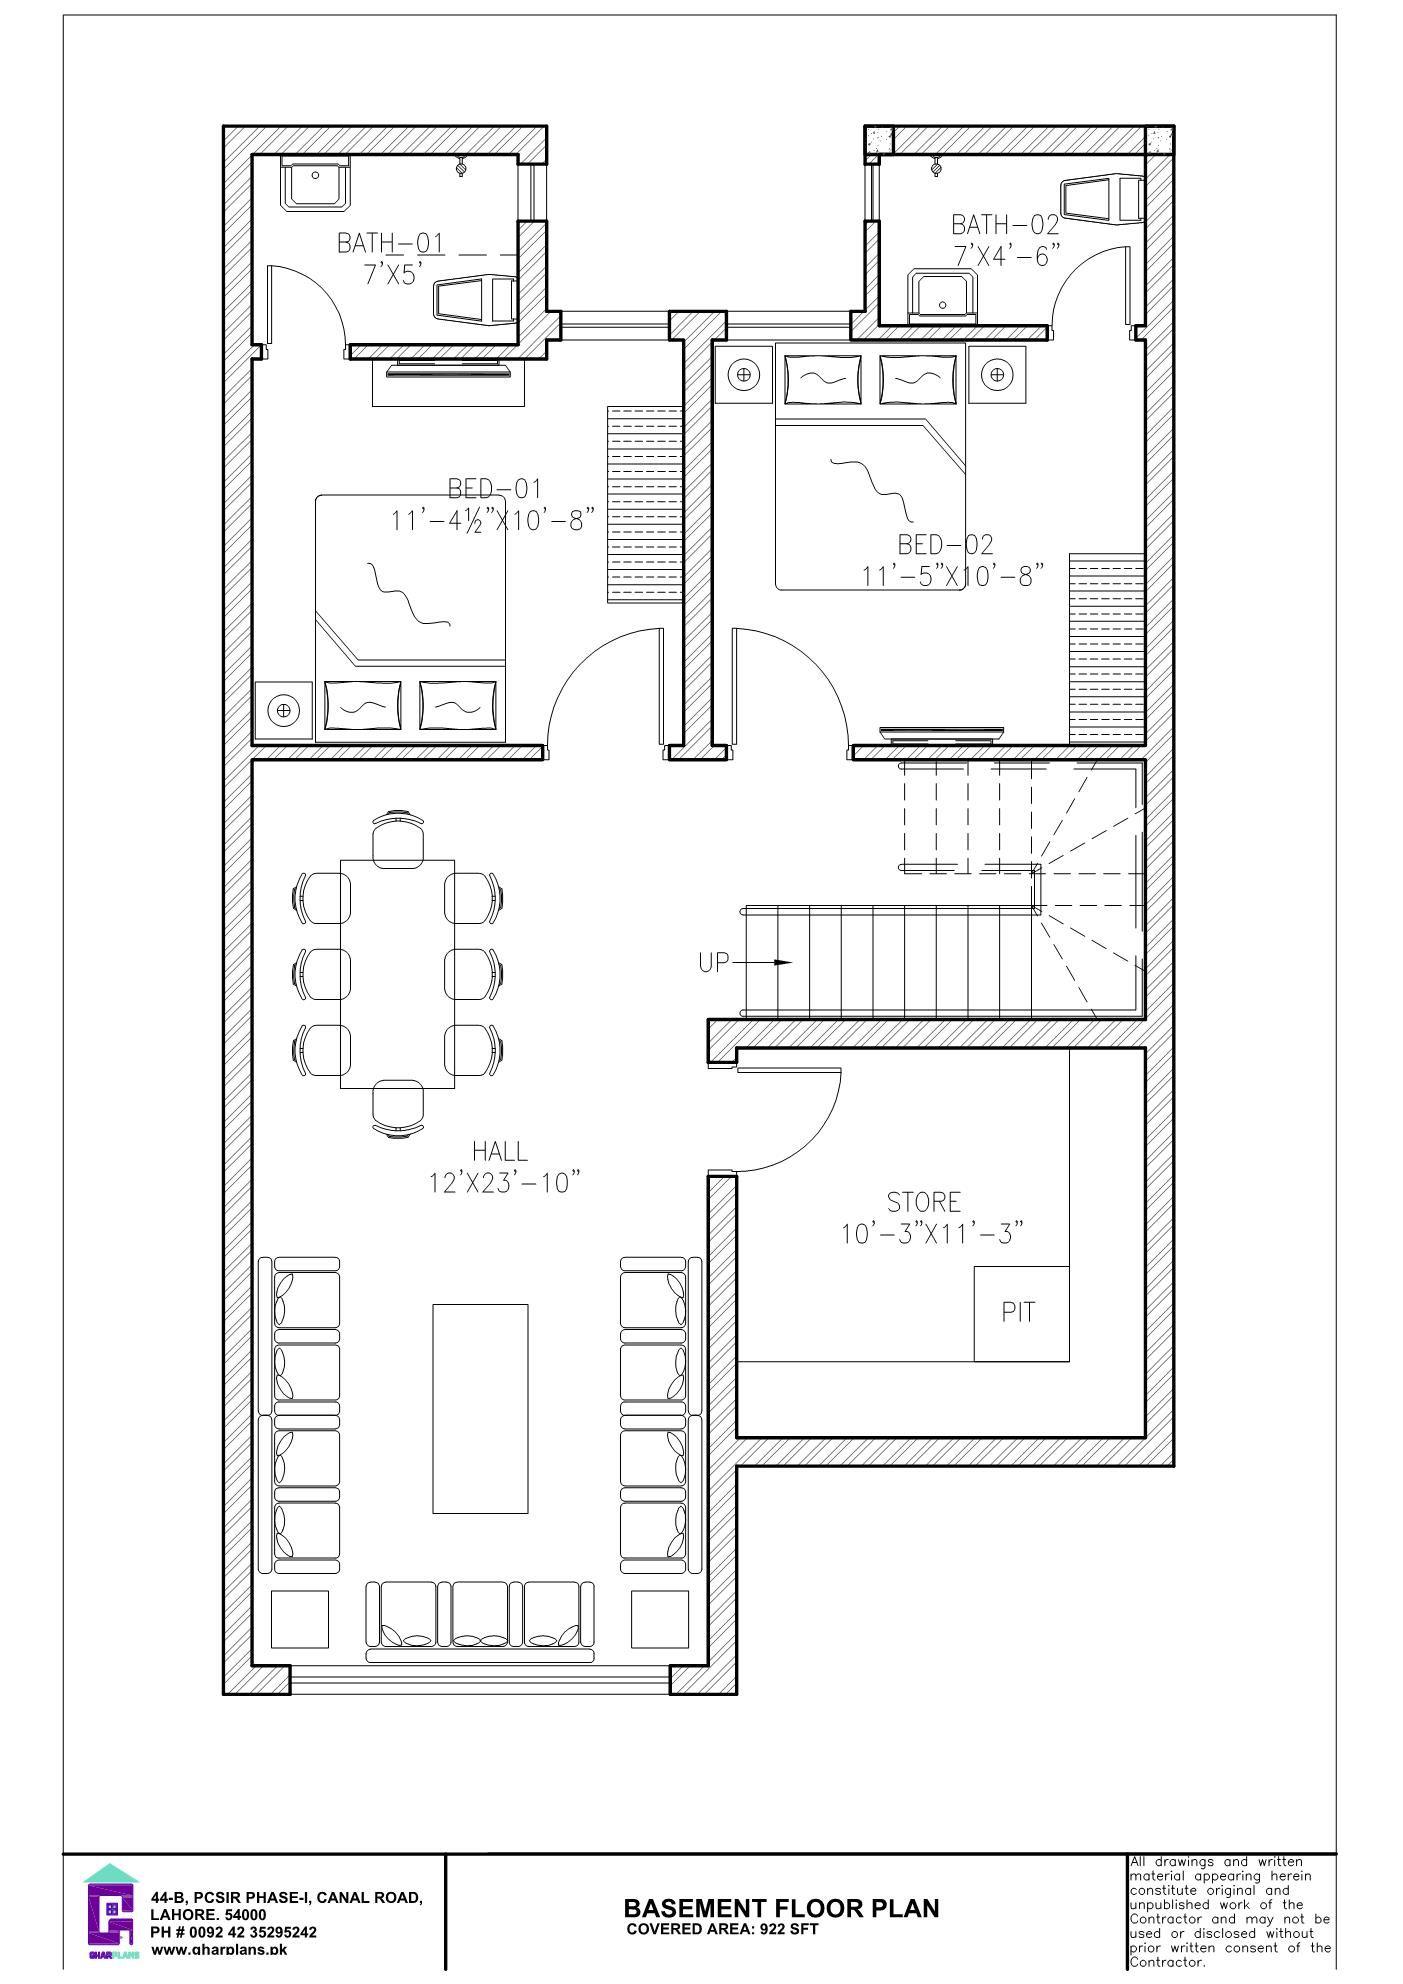 6 Bedroom 5 Marla Basement Floor Plan 5 Marla House Plan Basement Floor Plans House Plans